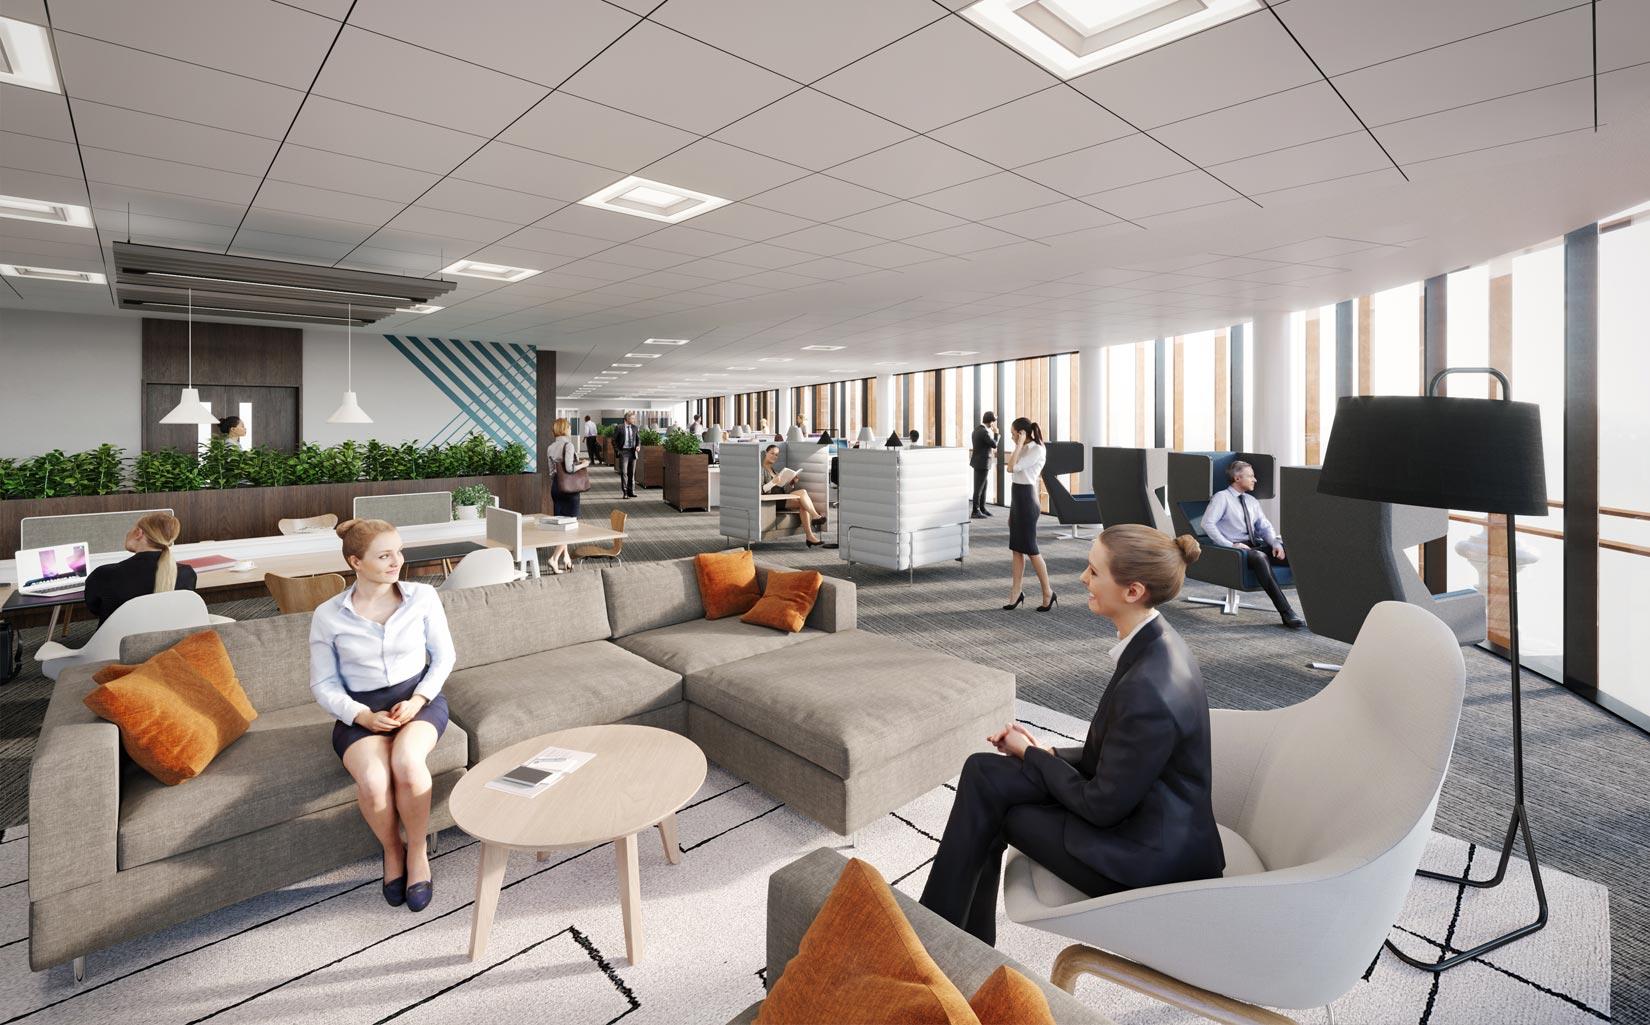 The Majestic, Leeds, office floor visual, Image © RIOT CGI Ltd